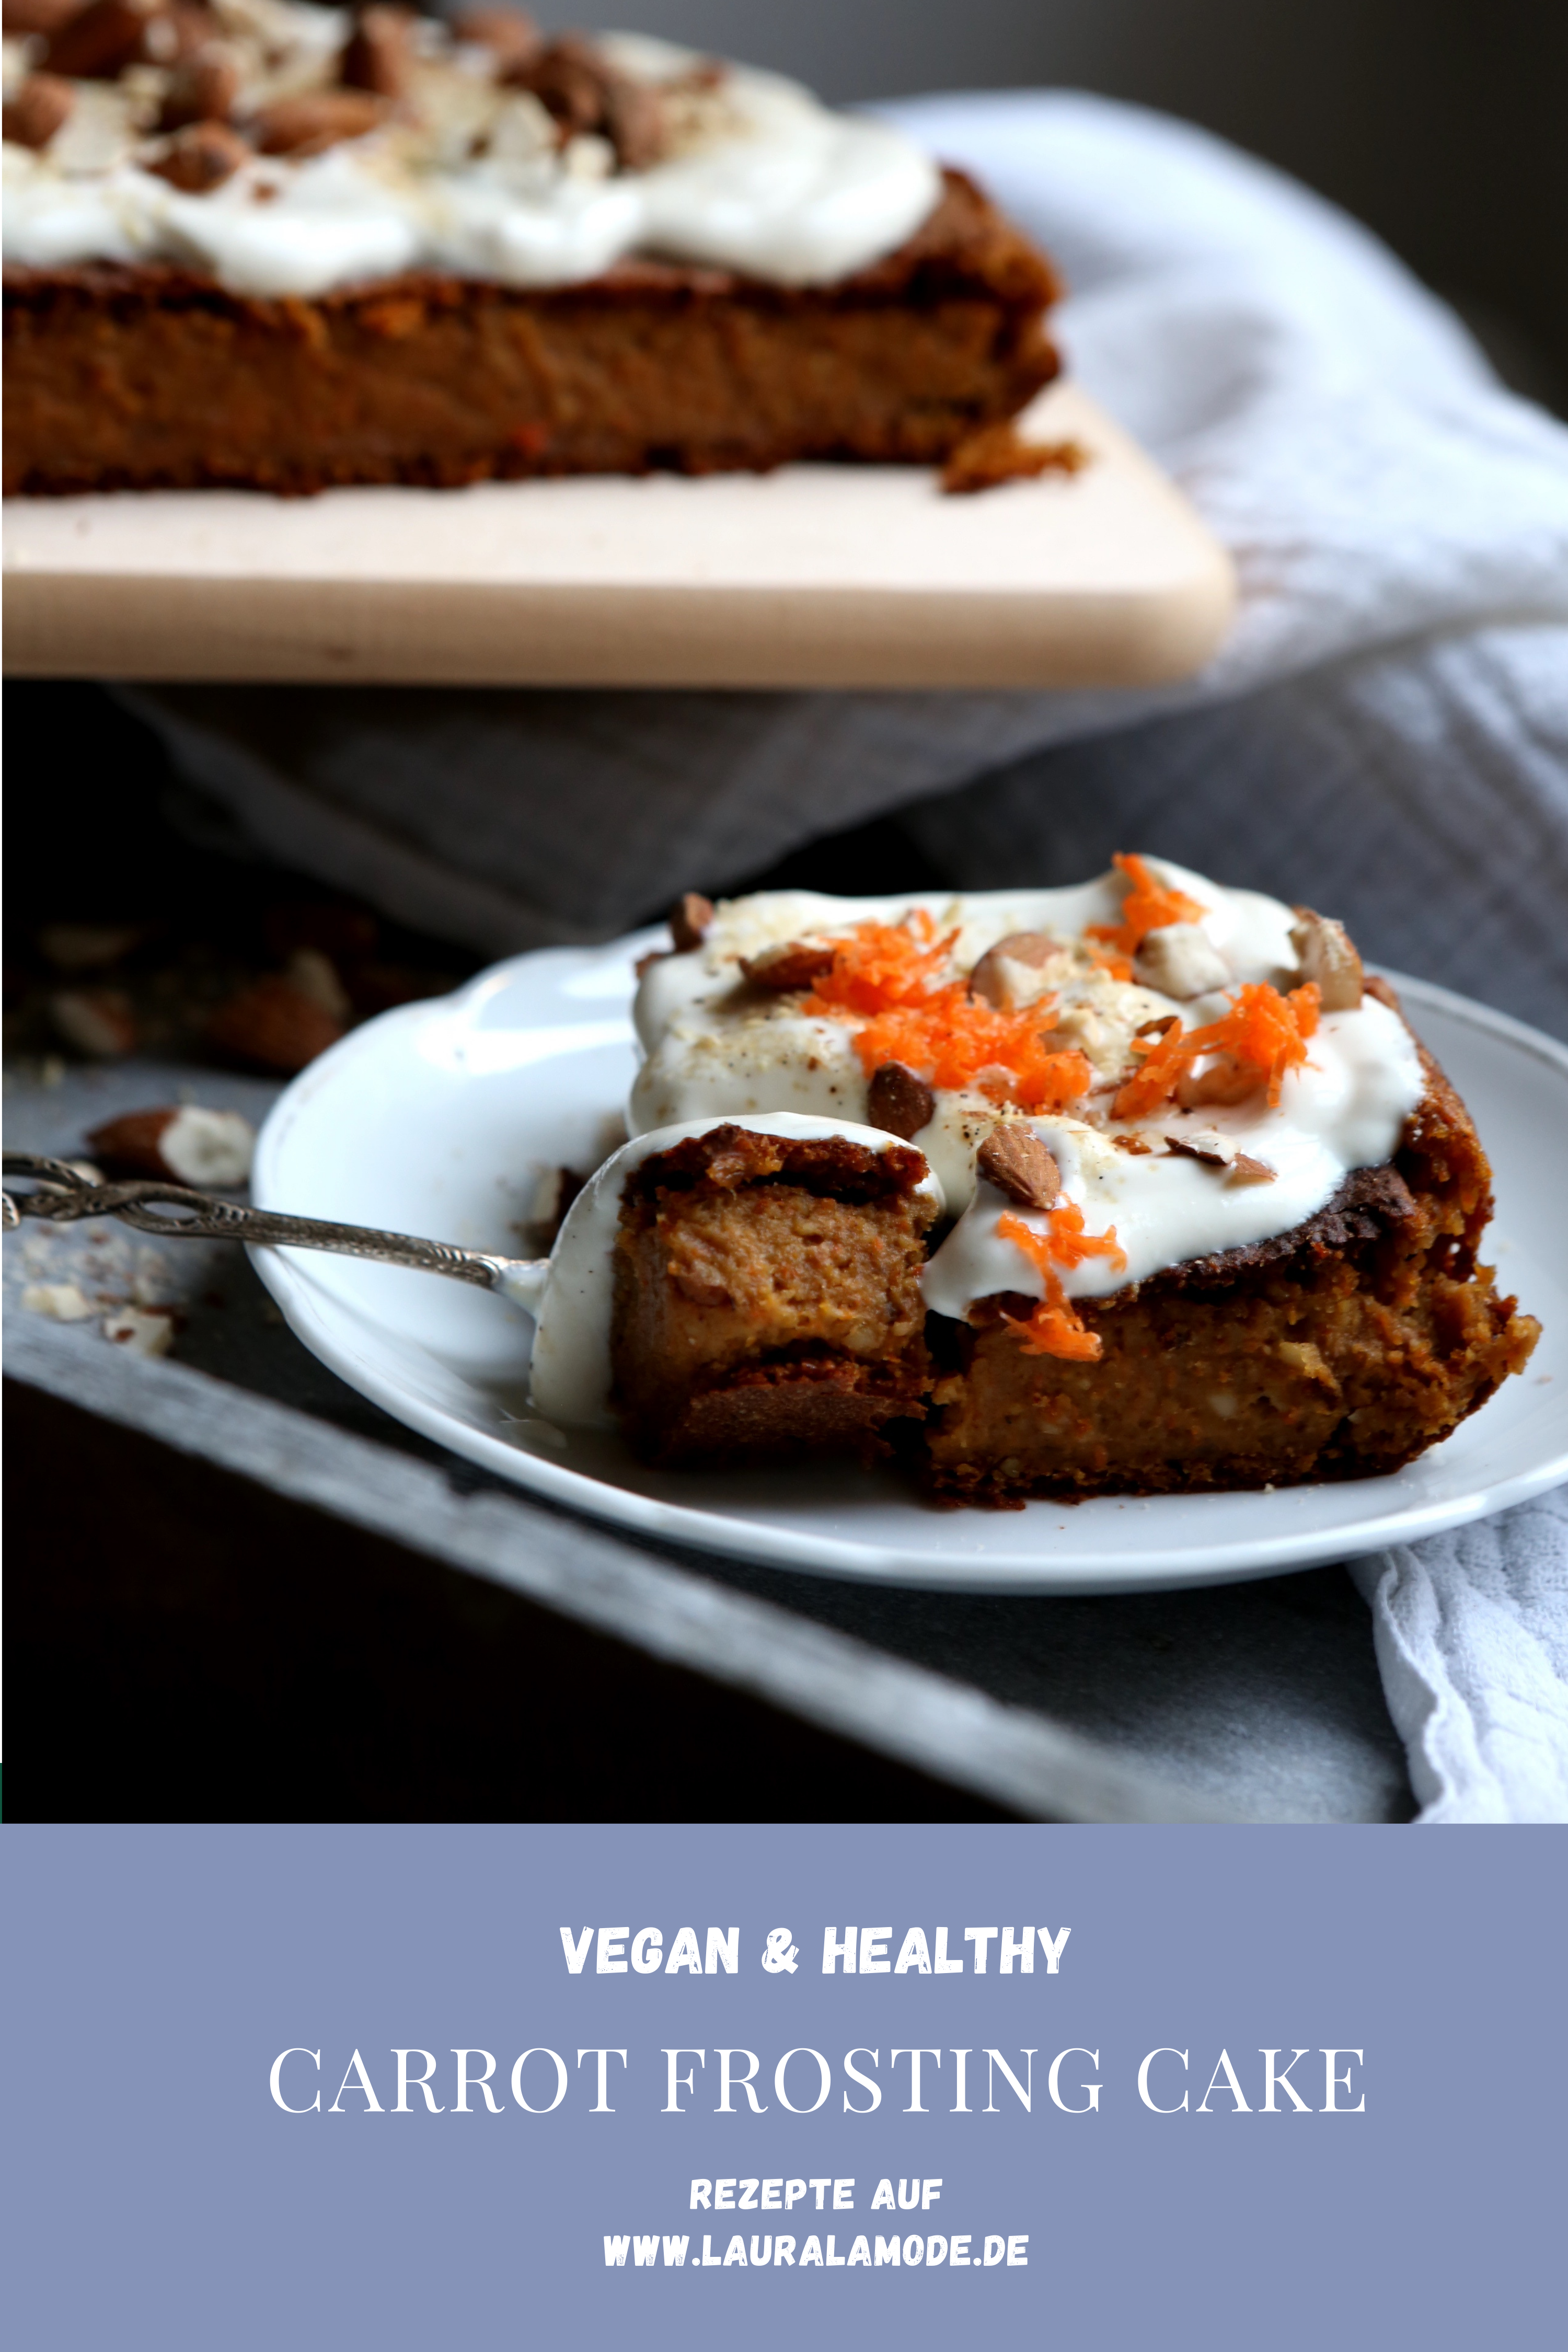 carrot cake-food-vegan-rezept-karotten kuchen-möhrenkuchen-healthy-healthy cake-fit food-fitness-fitness food-foodies-fitness food-low carb-abnehmen-foodblogger-foodblog-lauralamode